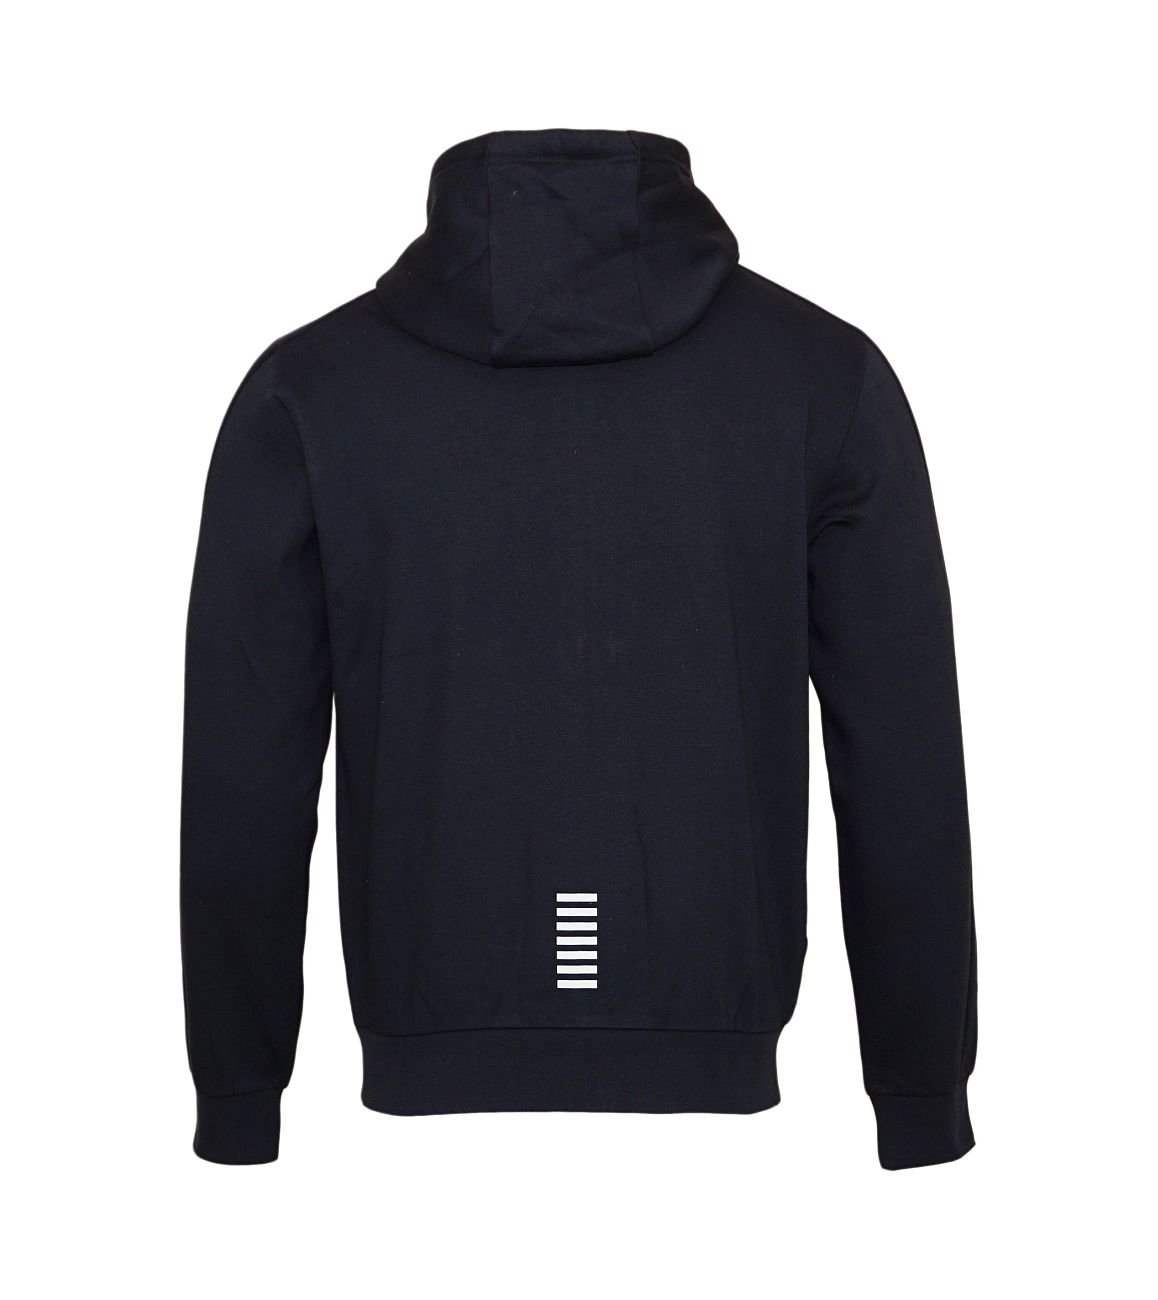 EA7 Emporio Armani Sweatshirt Jacke Hoodie 6YPM59 PJ07Z 1578 Night Blue SH18-EA7S